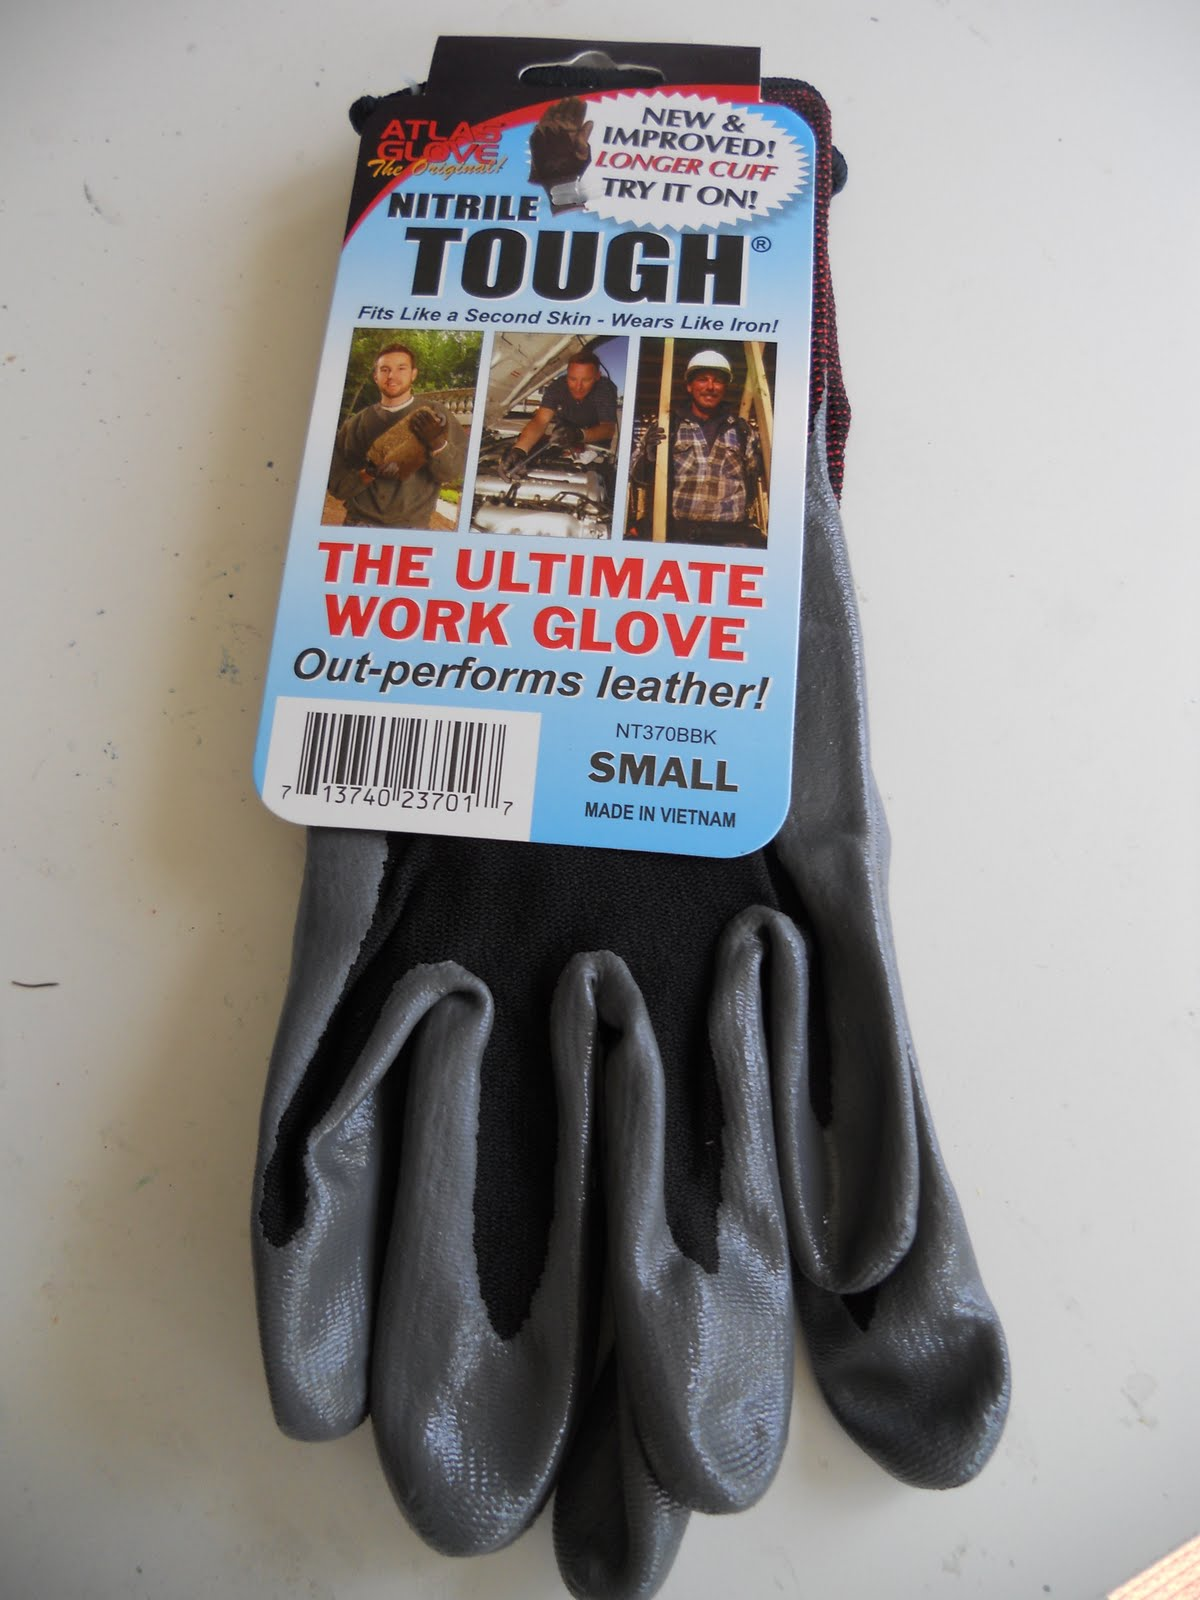 2010 ltd fetish Gloves jelsoft enterprises